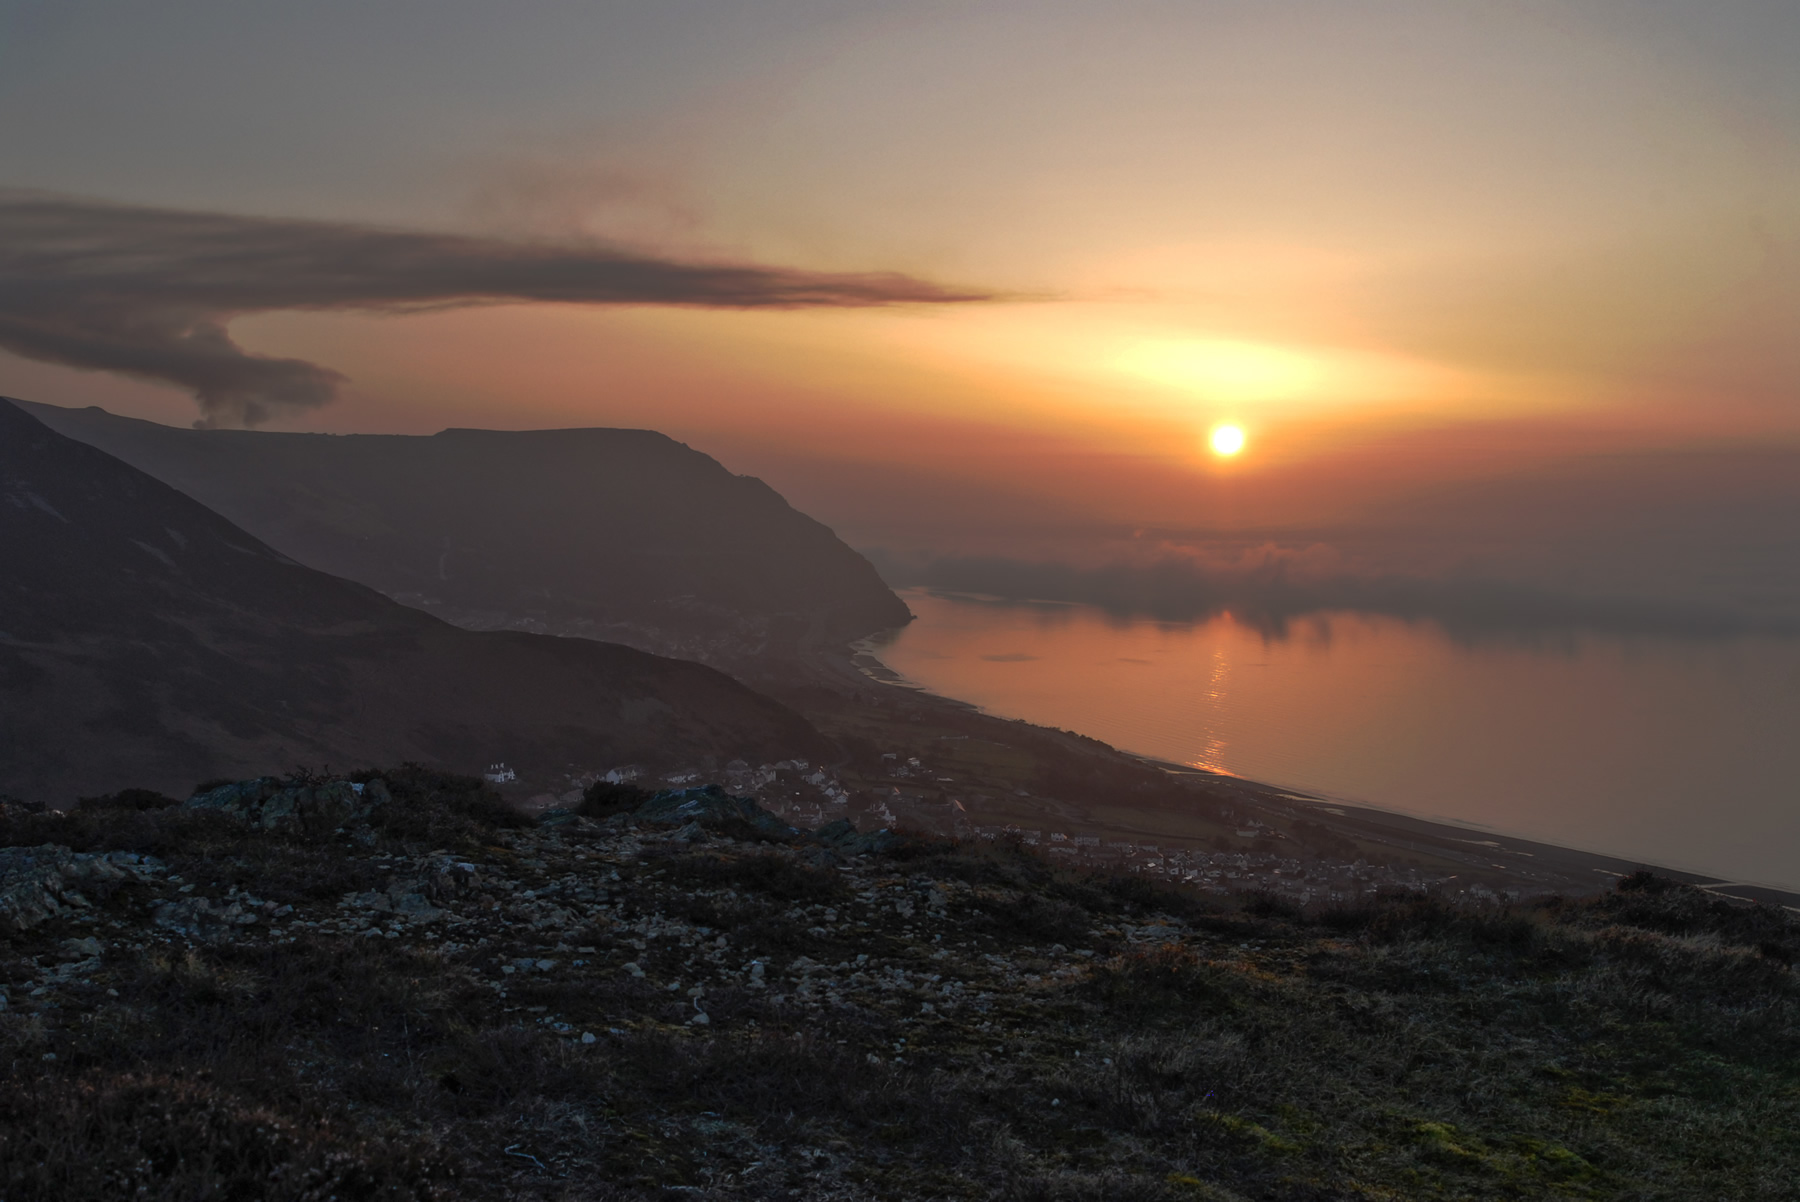 sunset_HDR2